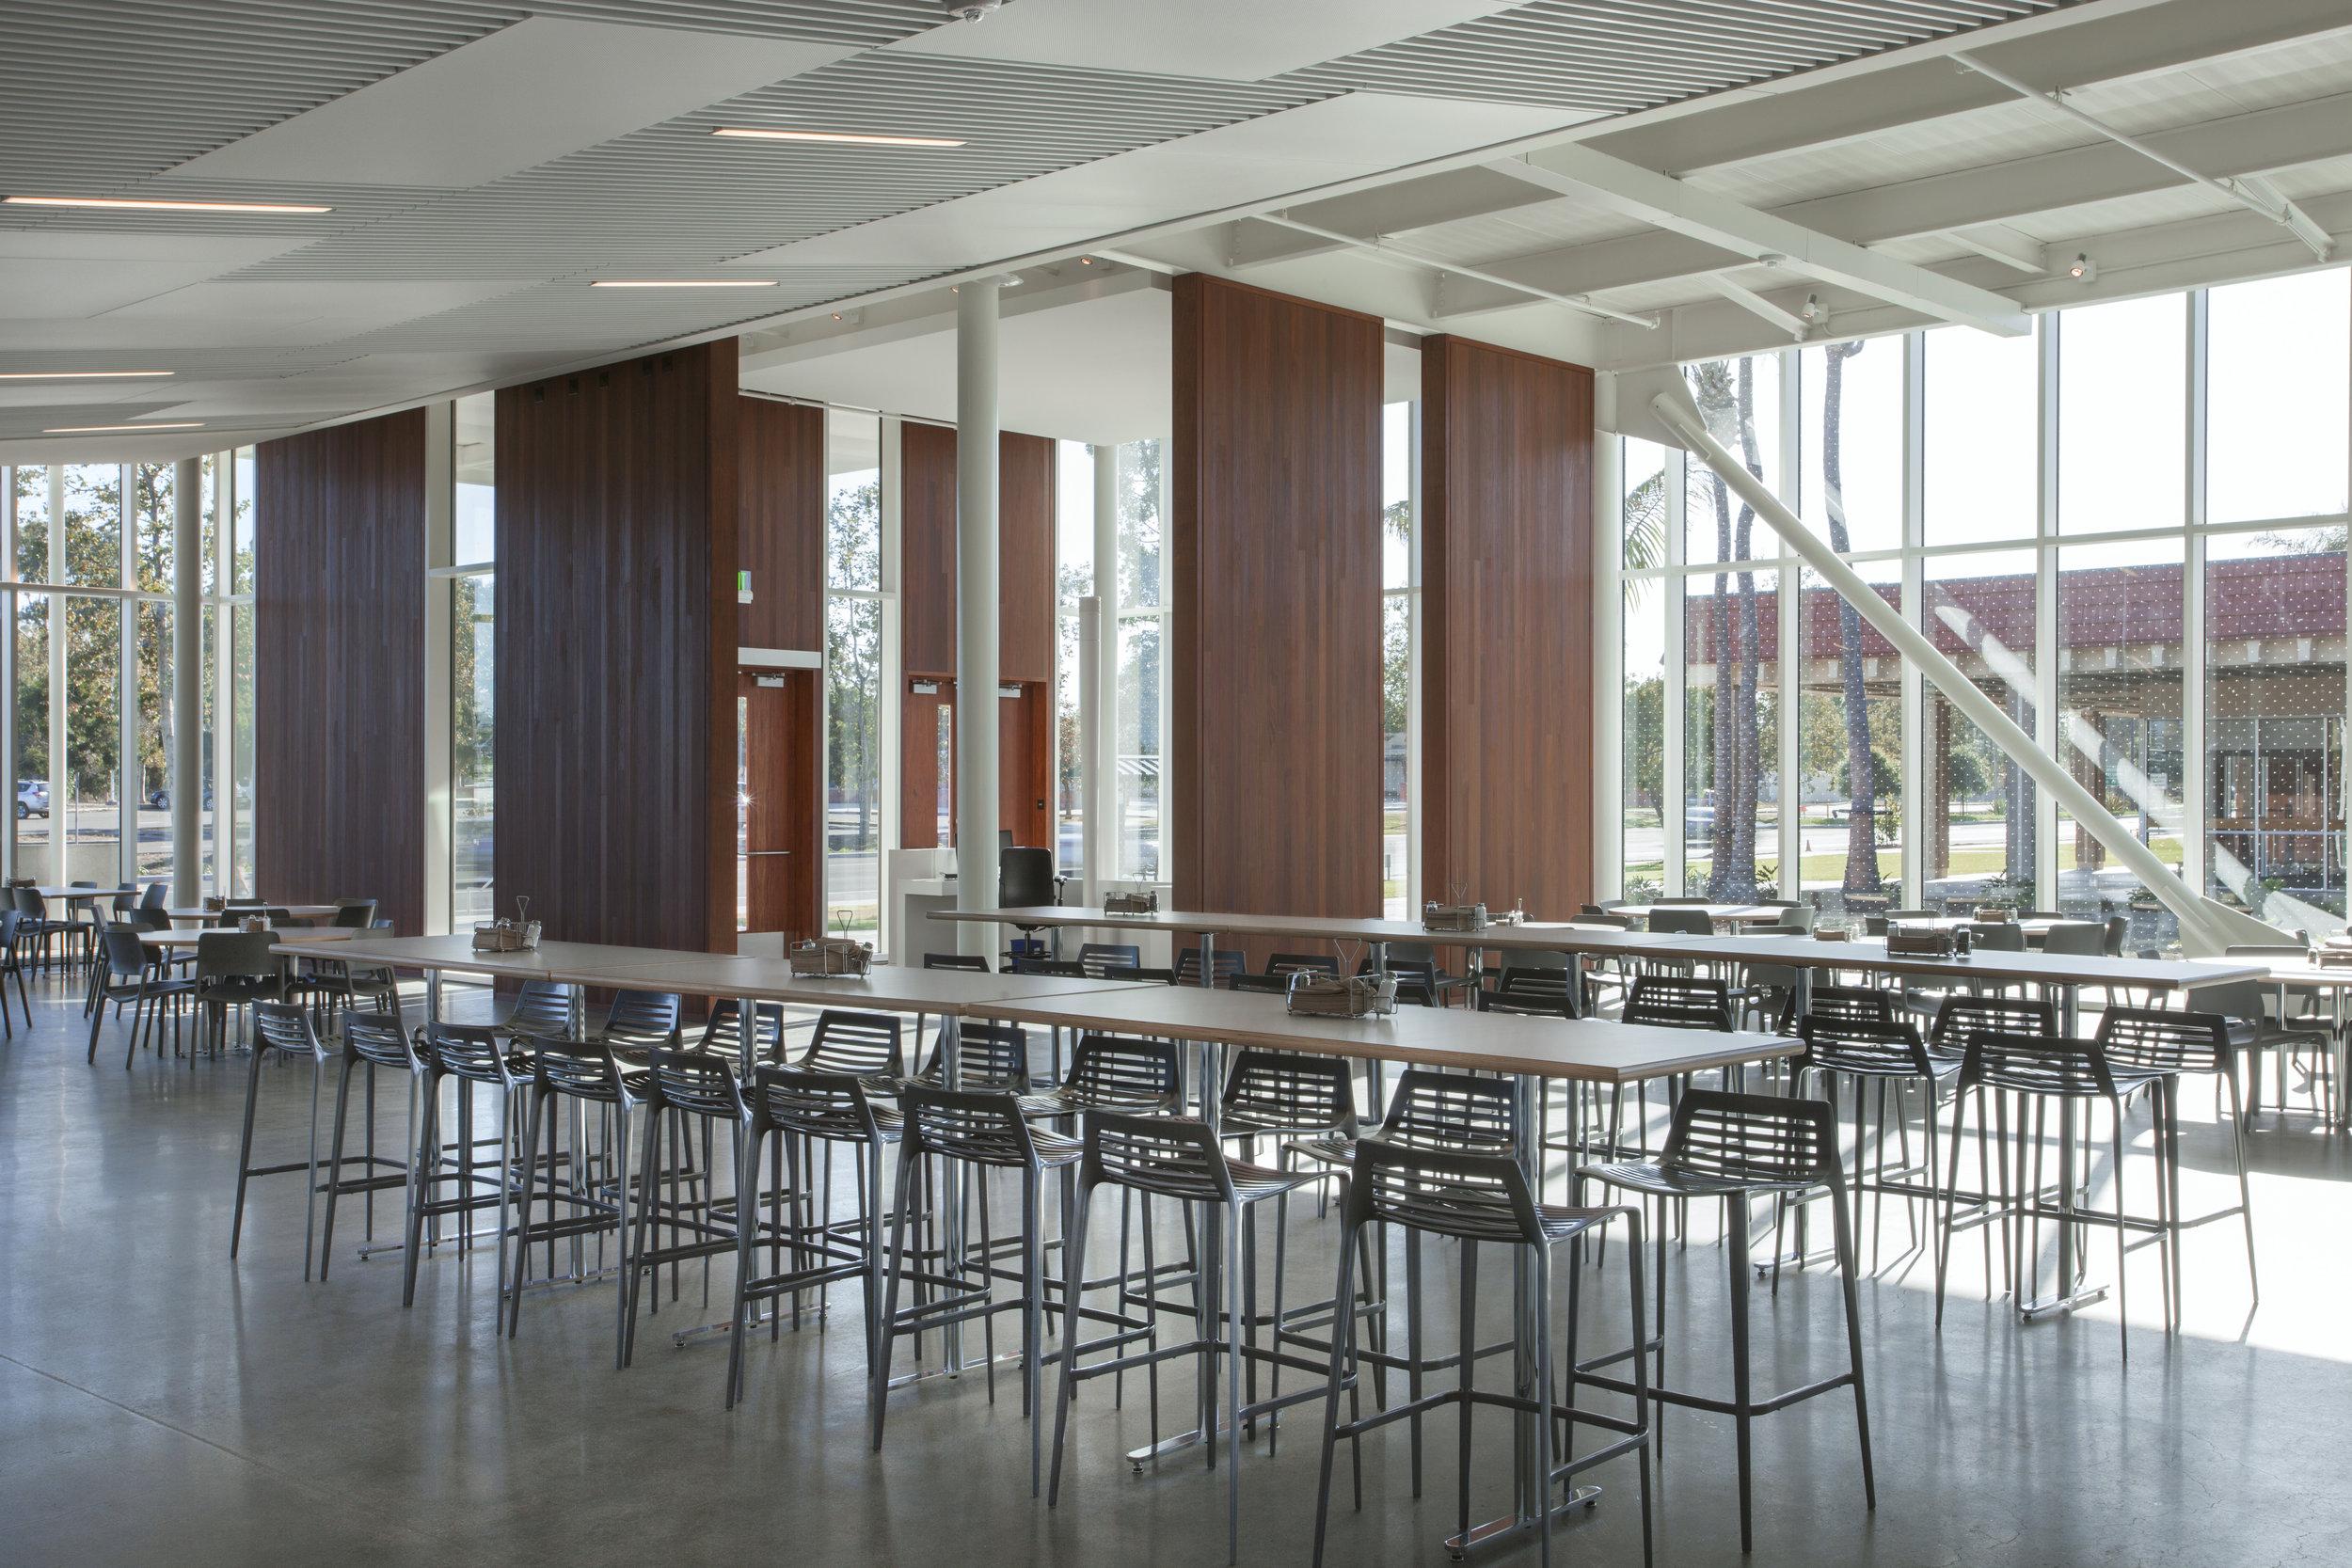 Portola Dining Commons